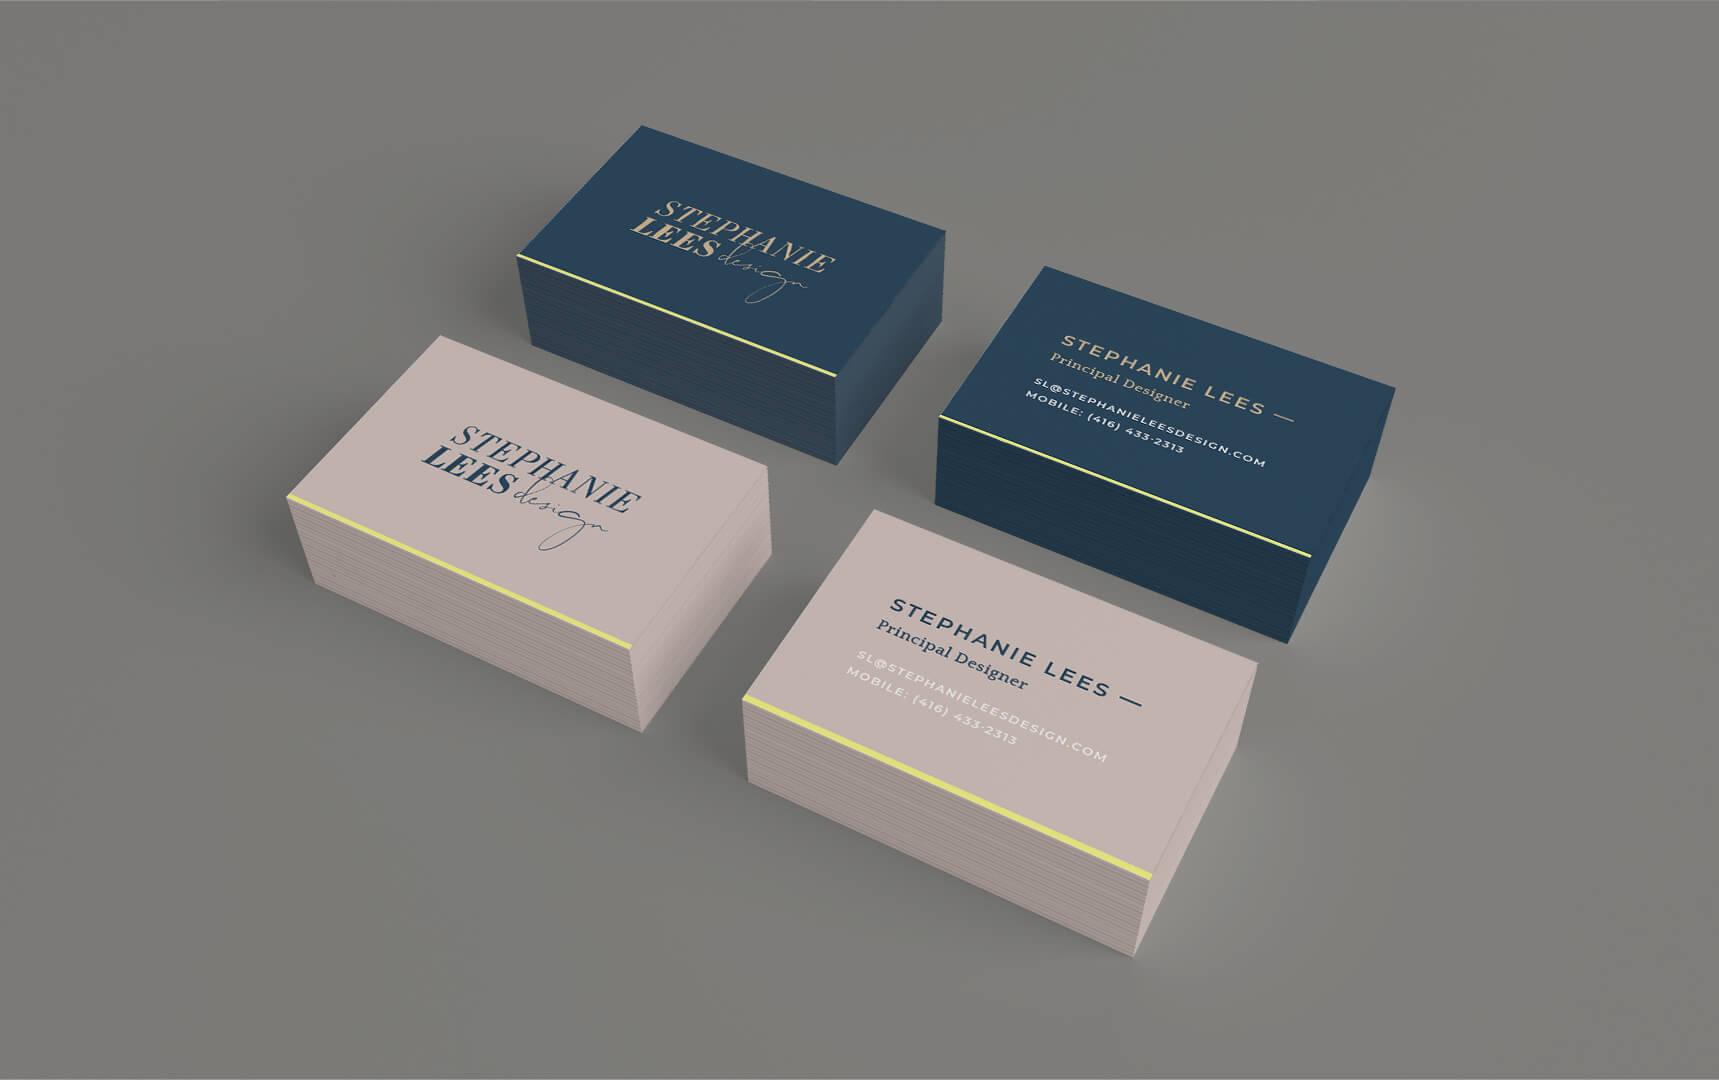 stephanie lees design interior design business cards